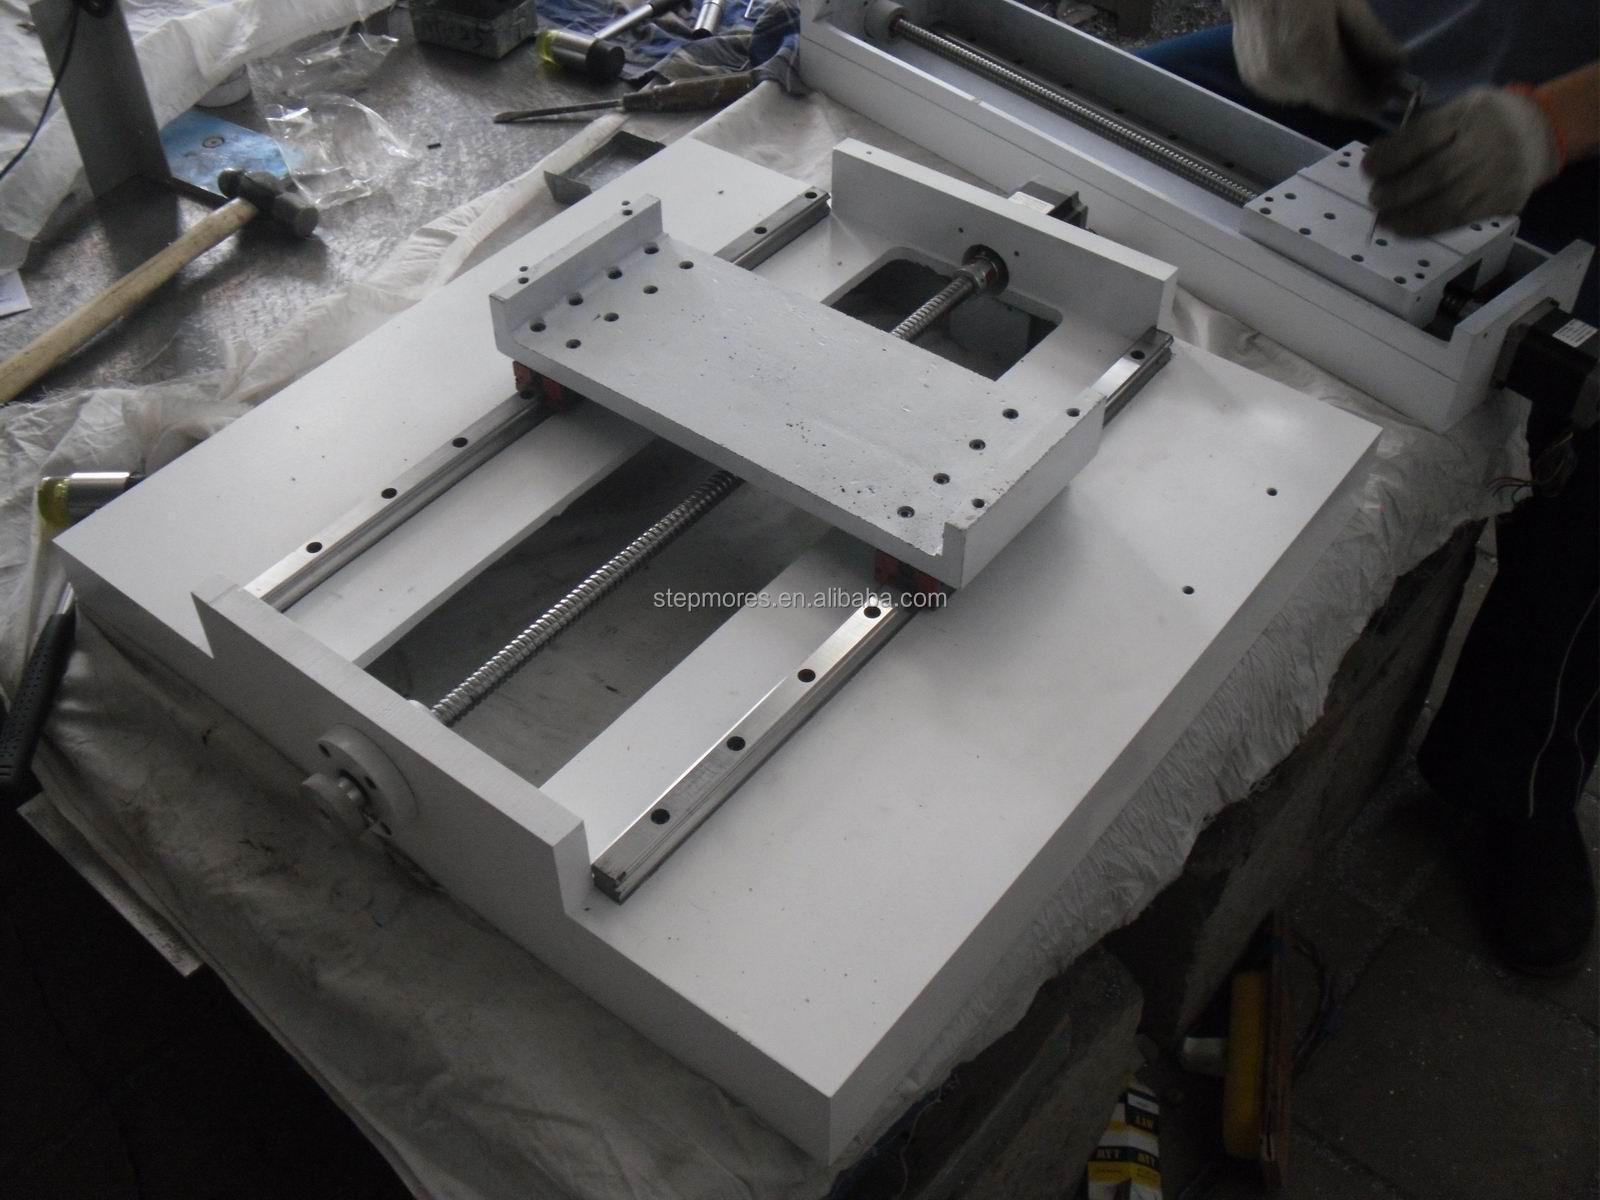 Iron Casting Body Sm 4040 Mini Cnc Milling Machine Cnc